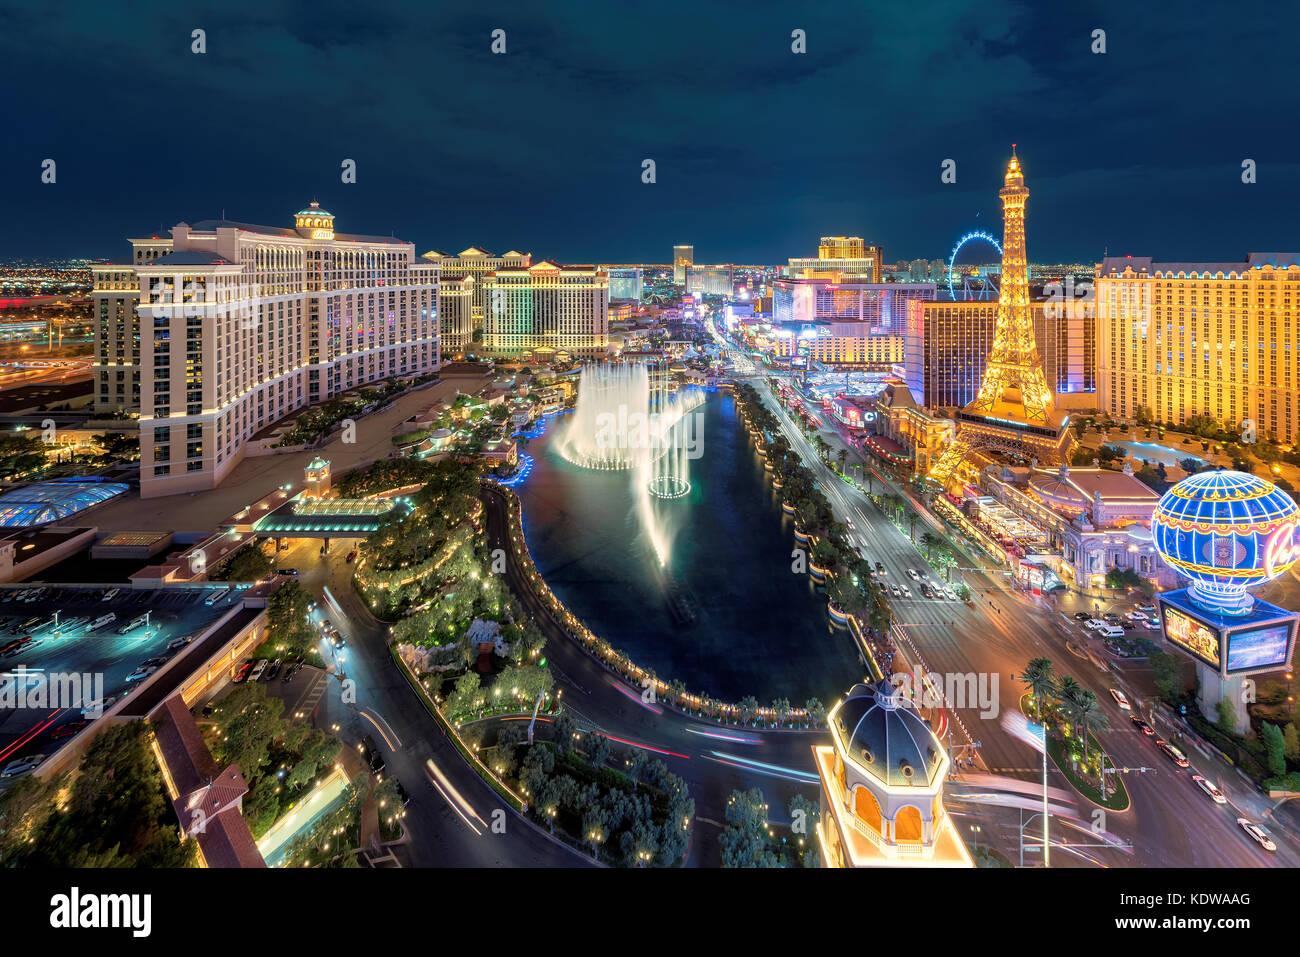 Luftbild des Las Vegas Strip bei Nacht Stockbild